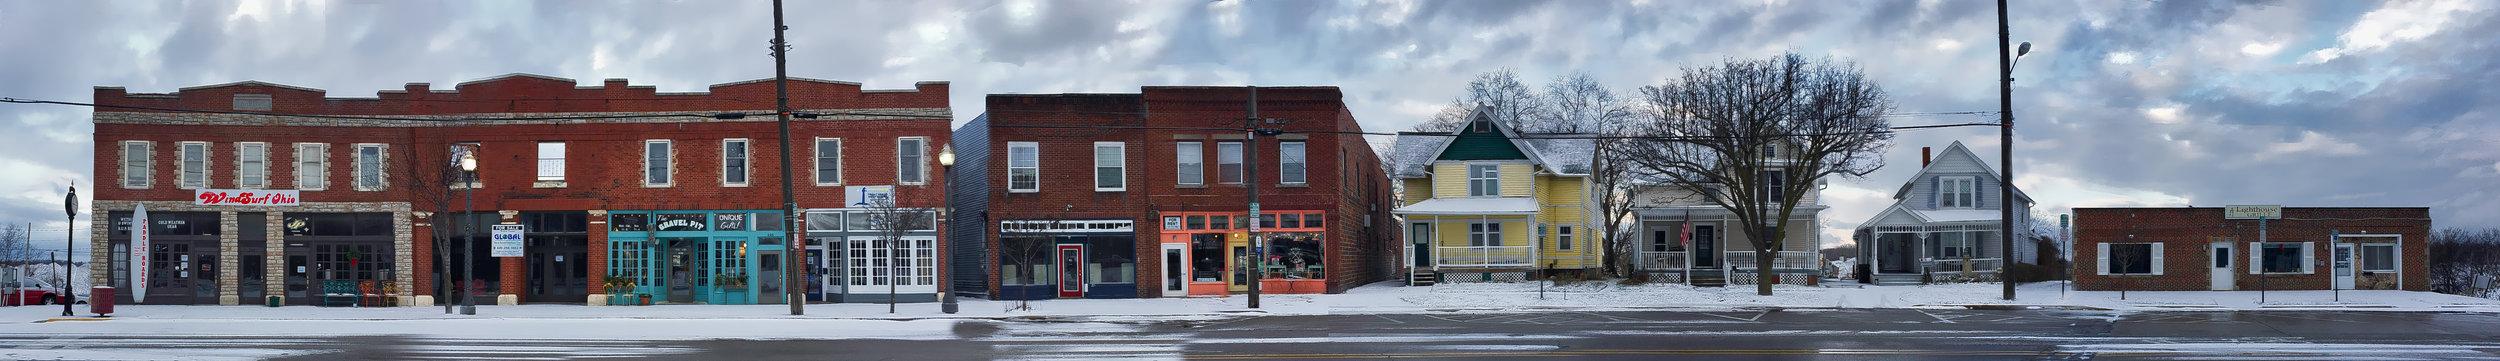 Downtown Fairport Harbor, Ohio